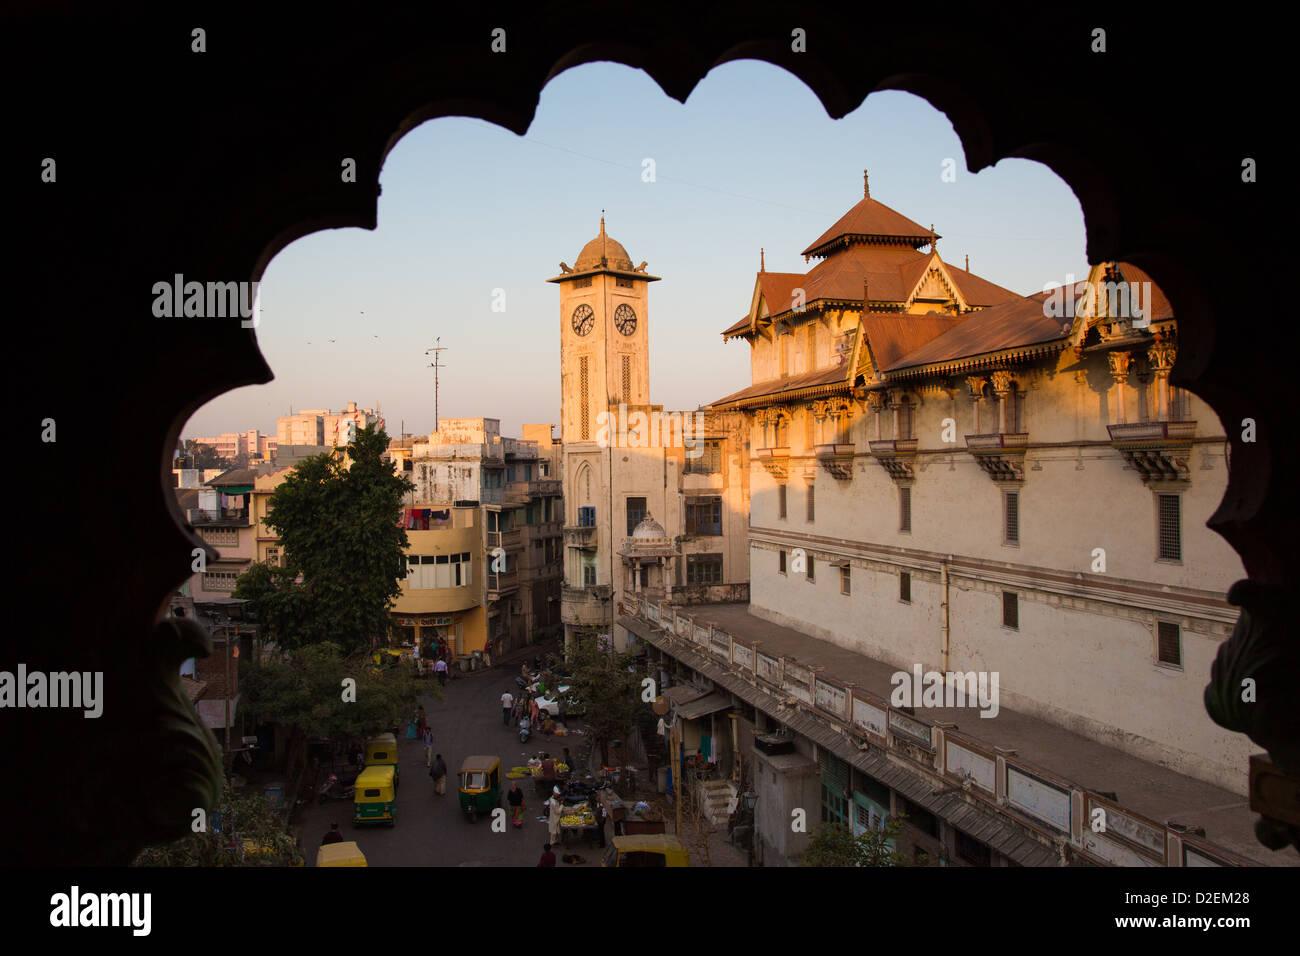 Swaminara Hindu Temple Complex, Ahmedabad, Gujarat, India - Stock Image